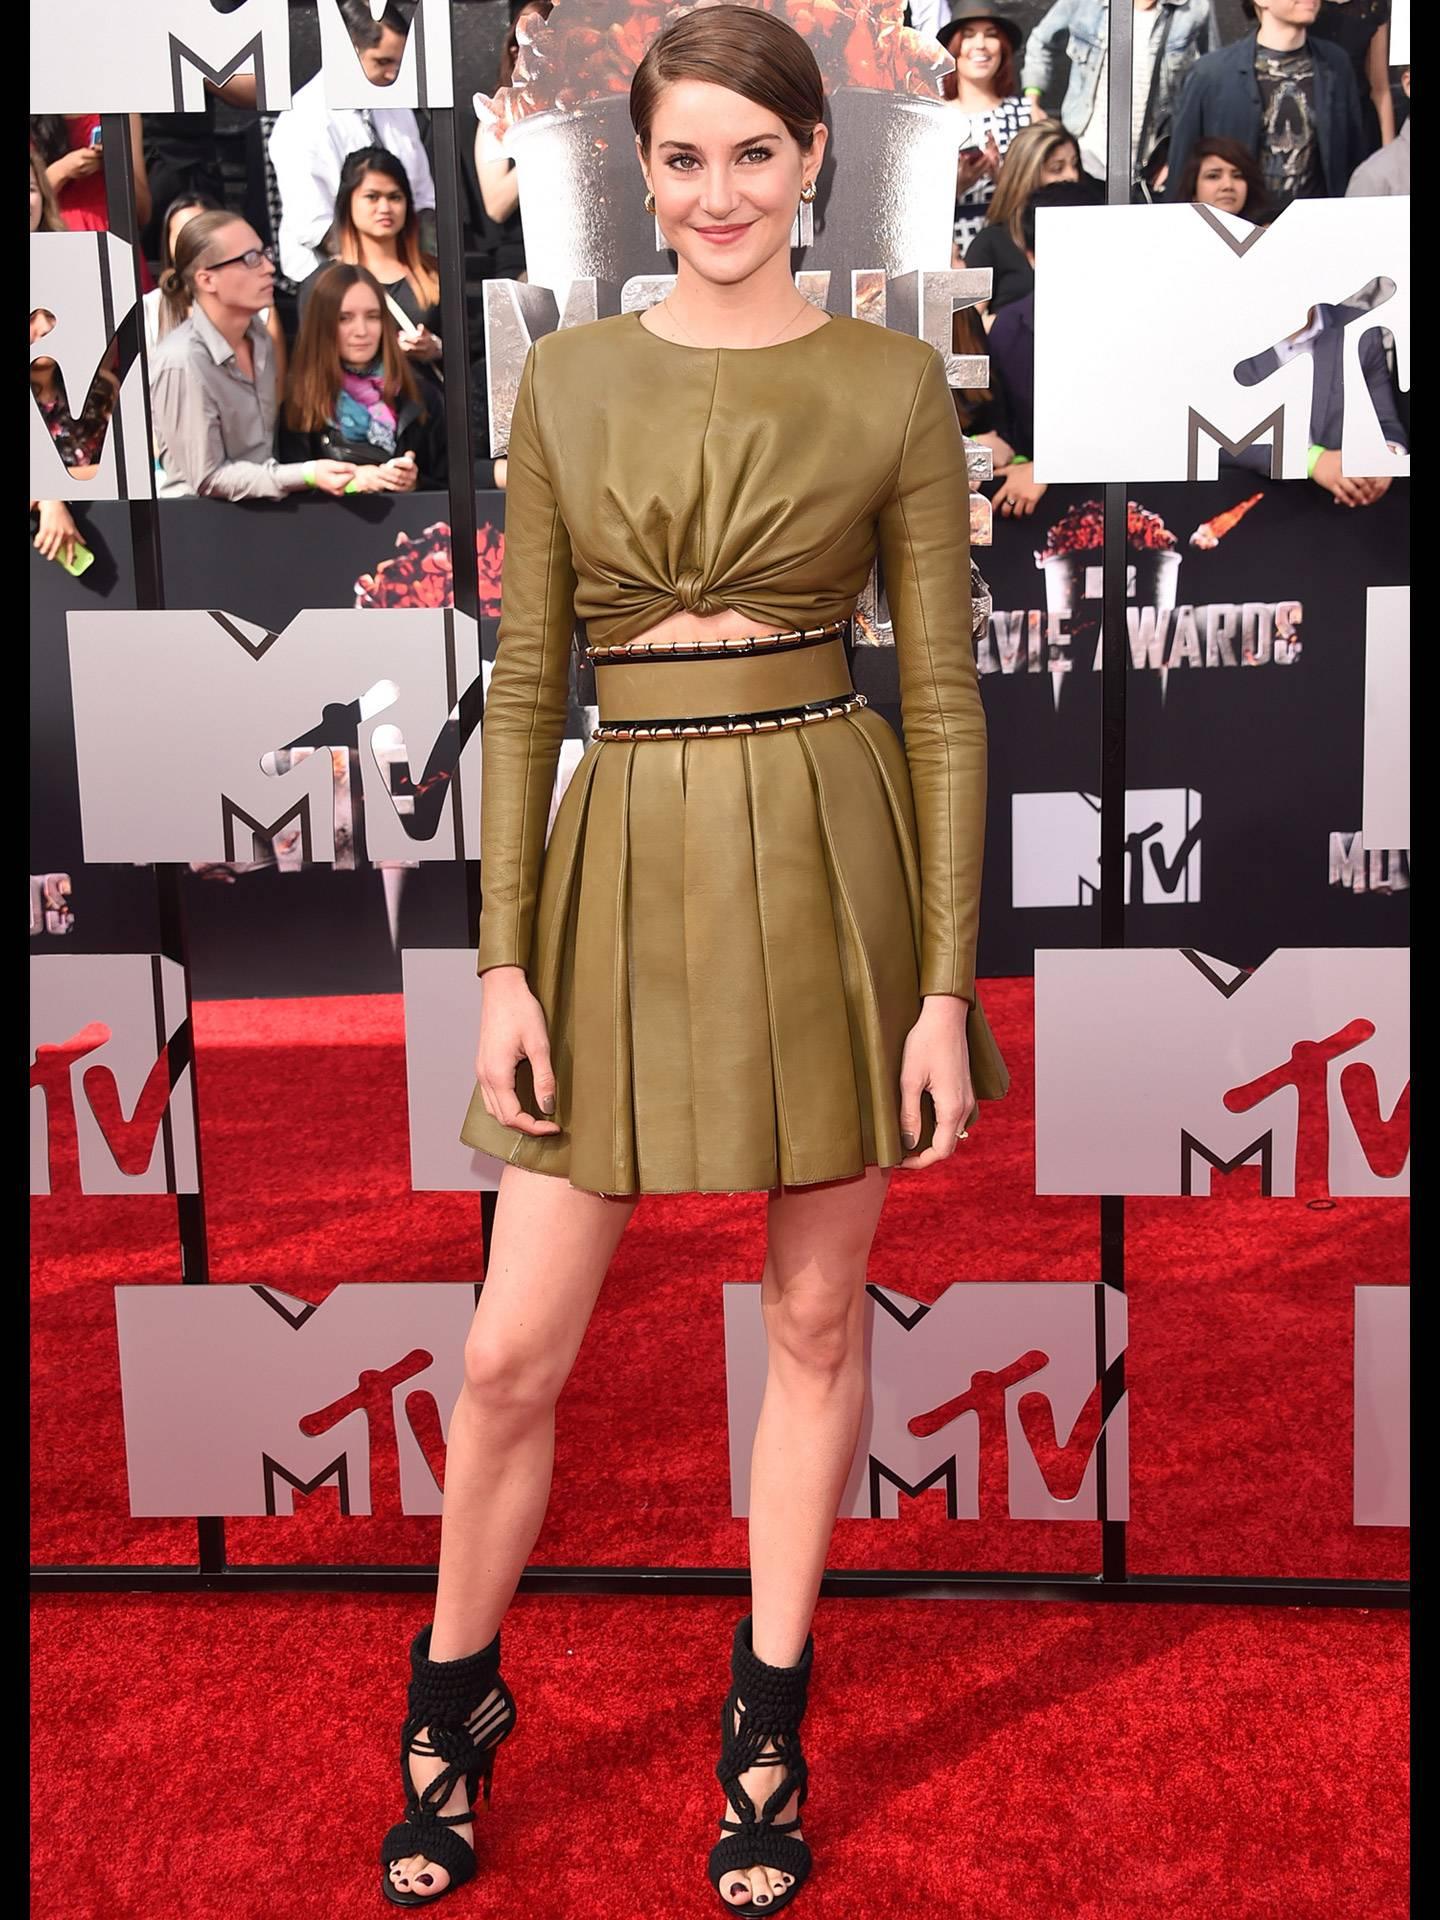 mgid:file:gsp:scenic:/international/mtvla.com/Shailene-Woodley-Getty-Images-for-MTV-484657315.jpg